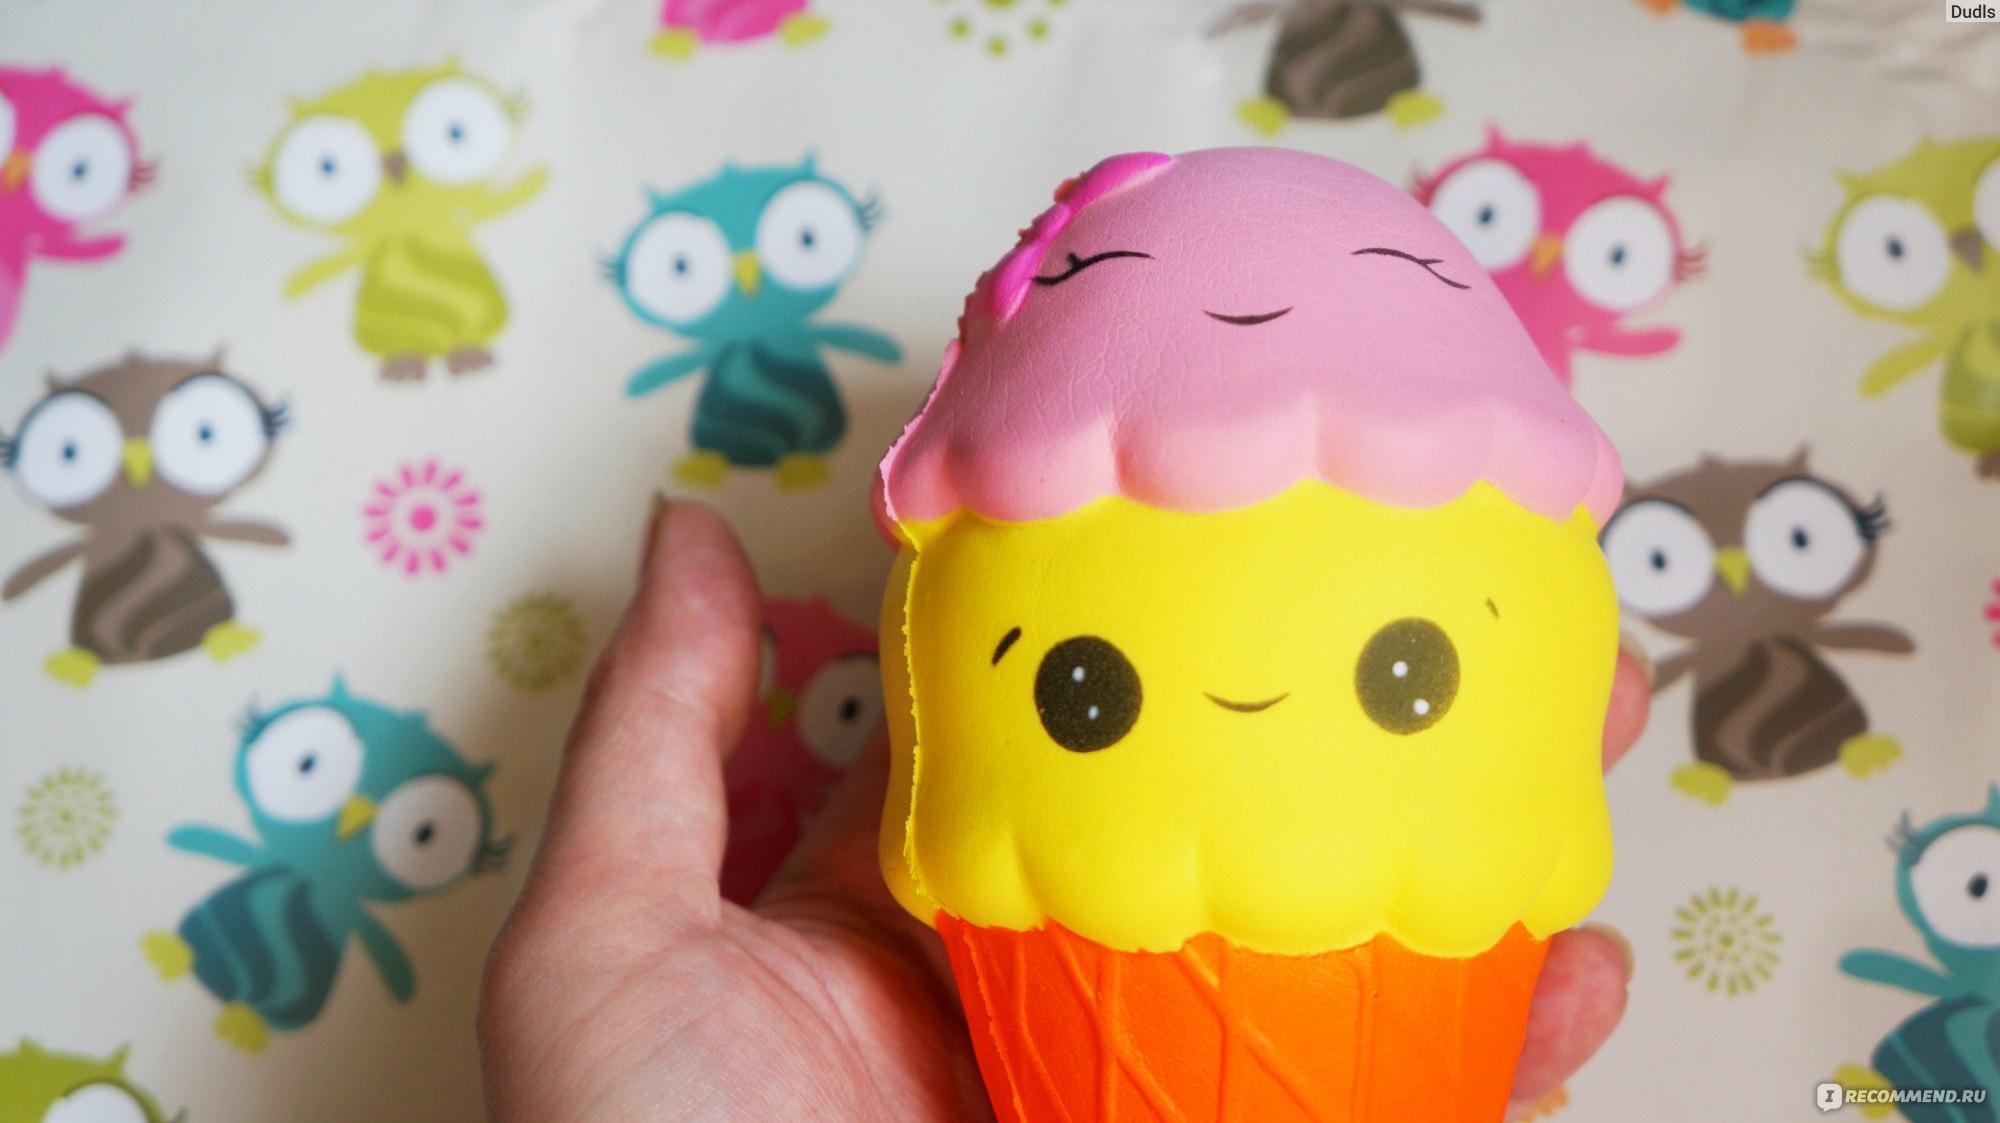 Сквиши – новые игрушки-антистресс